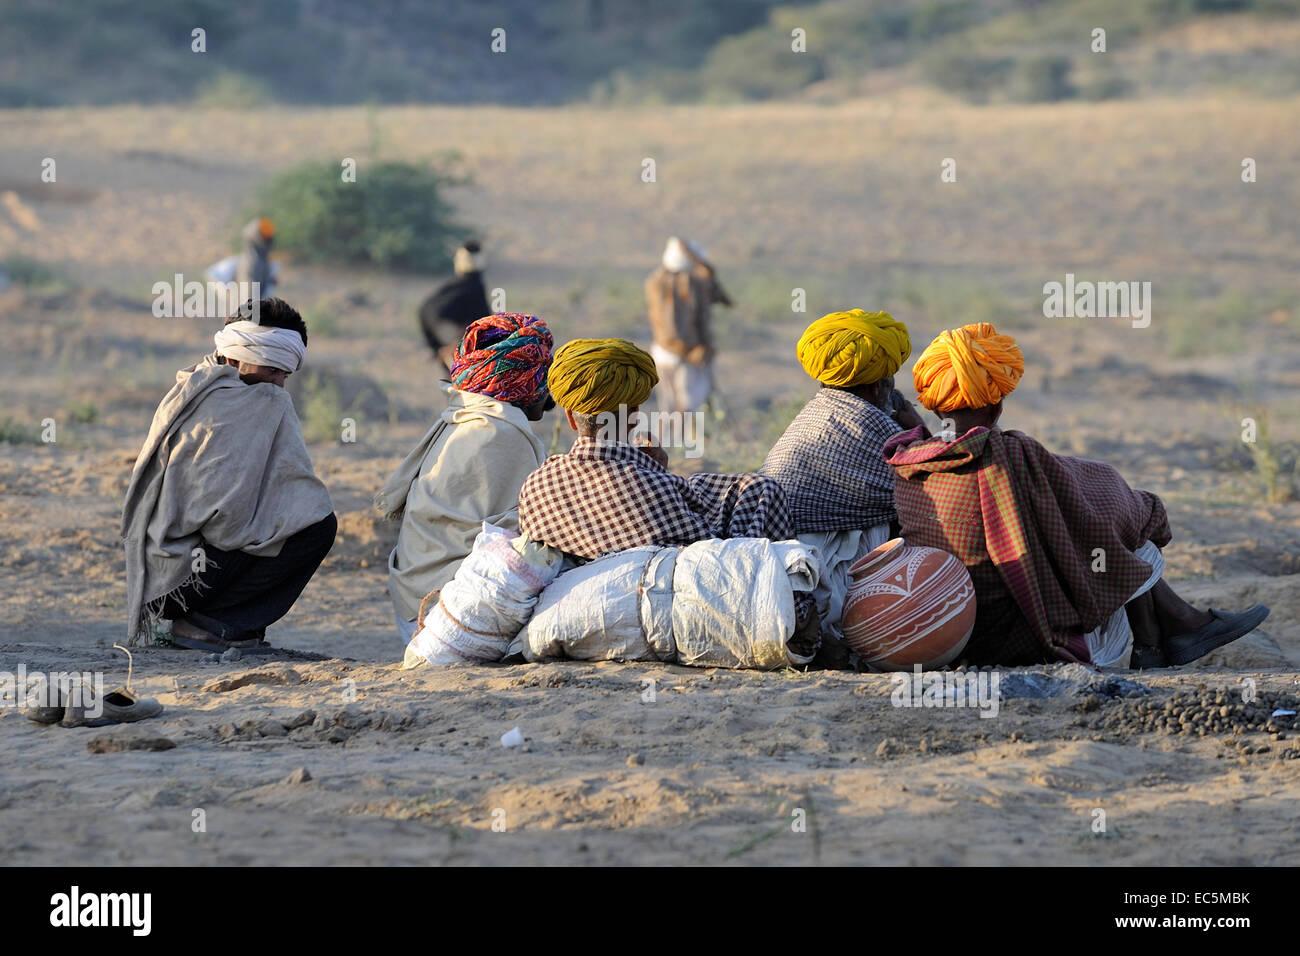 Shepherds take relax in the desert Stock Photo